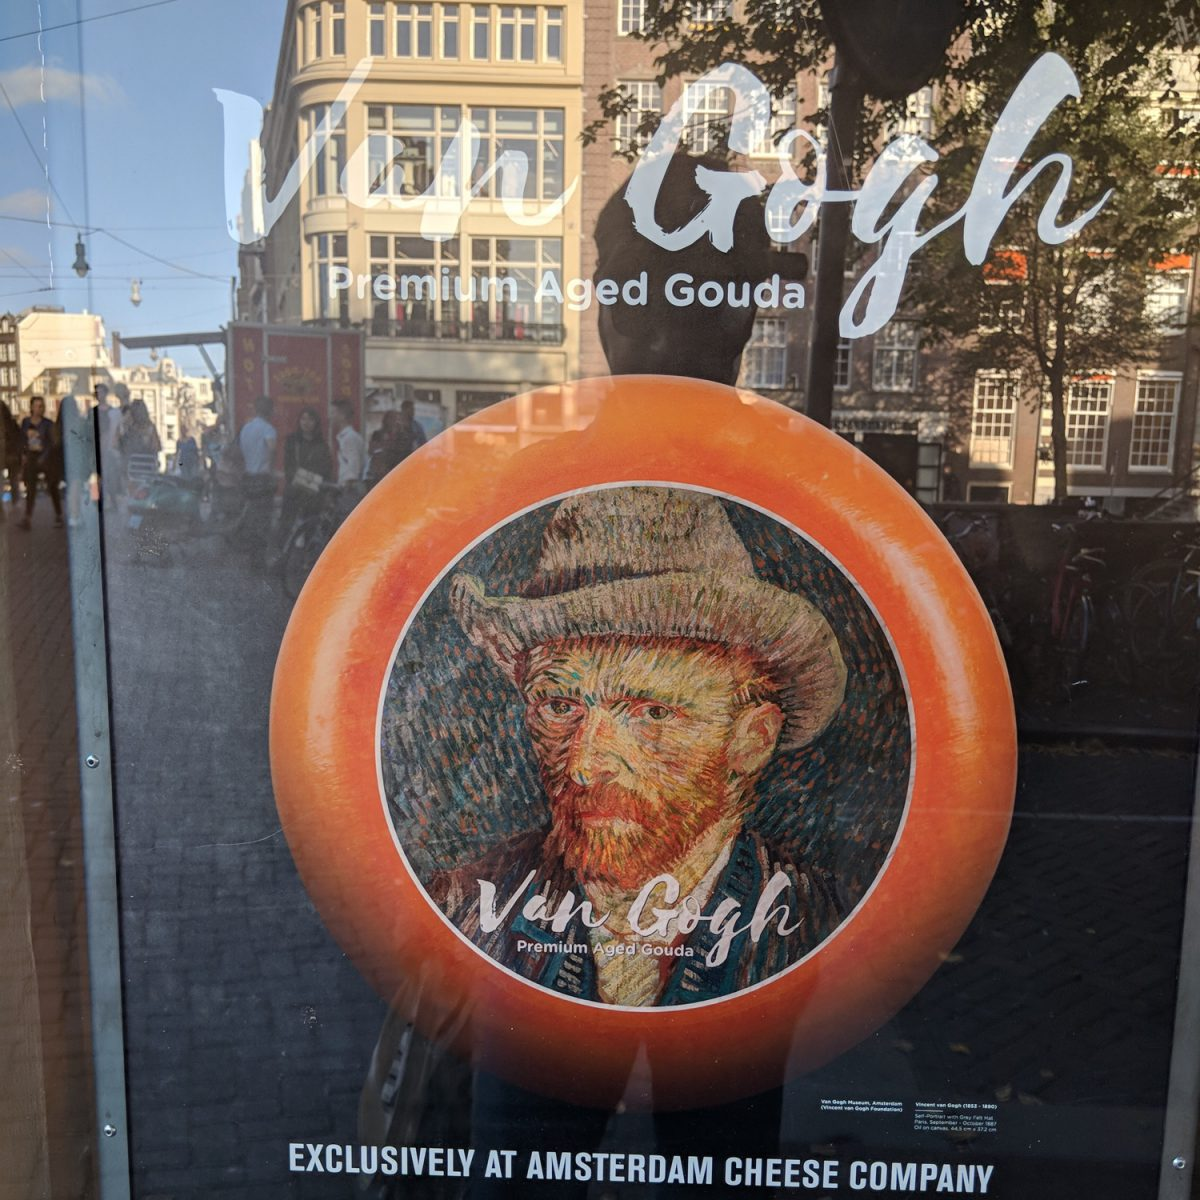 Van Gogh Premium Aged Gouda. Eigenes Foto